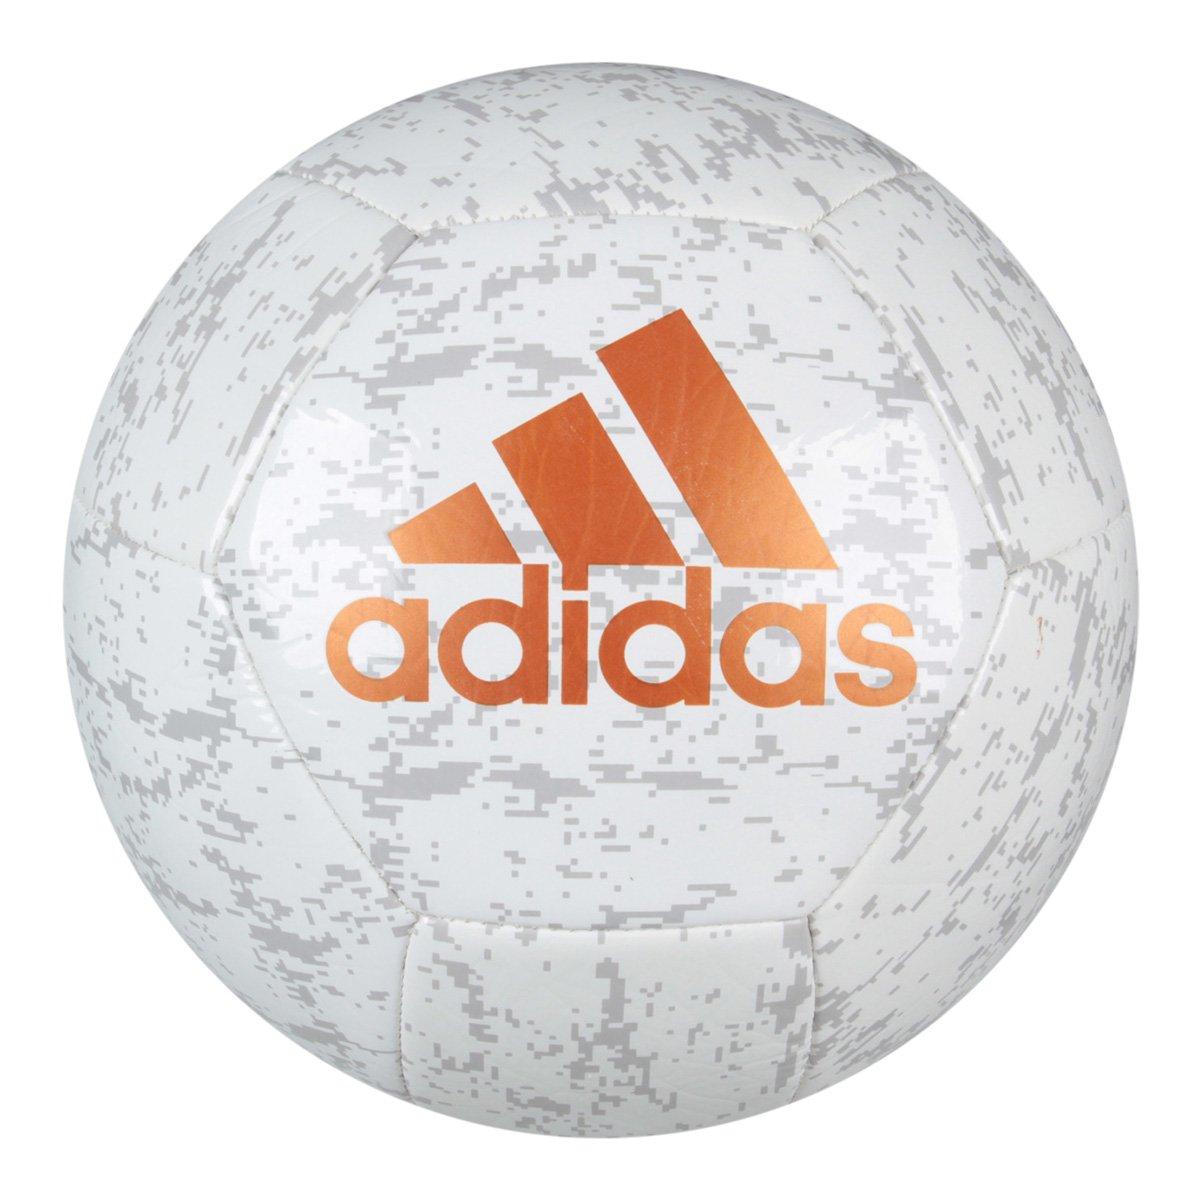 Bola Futebol Campo Adidas Glider II - Compre Agora  cd9d8b5d3900f